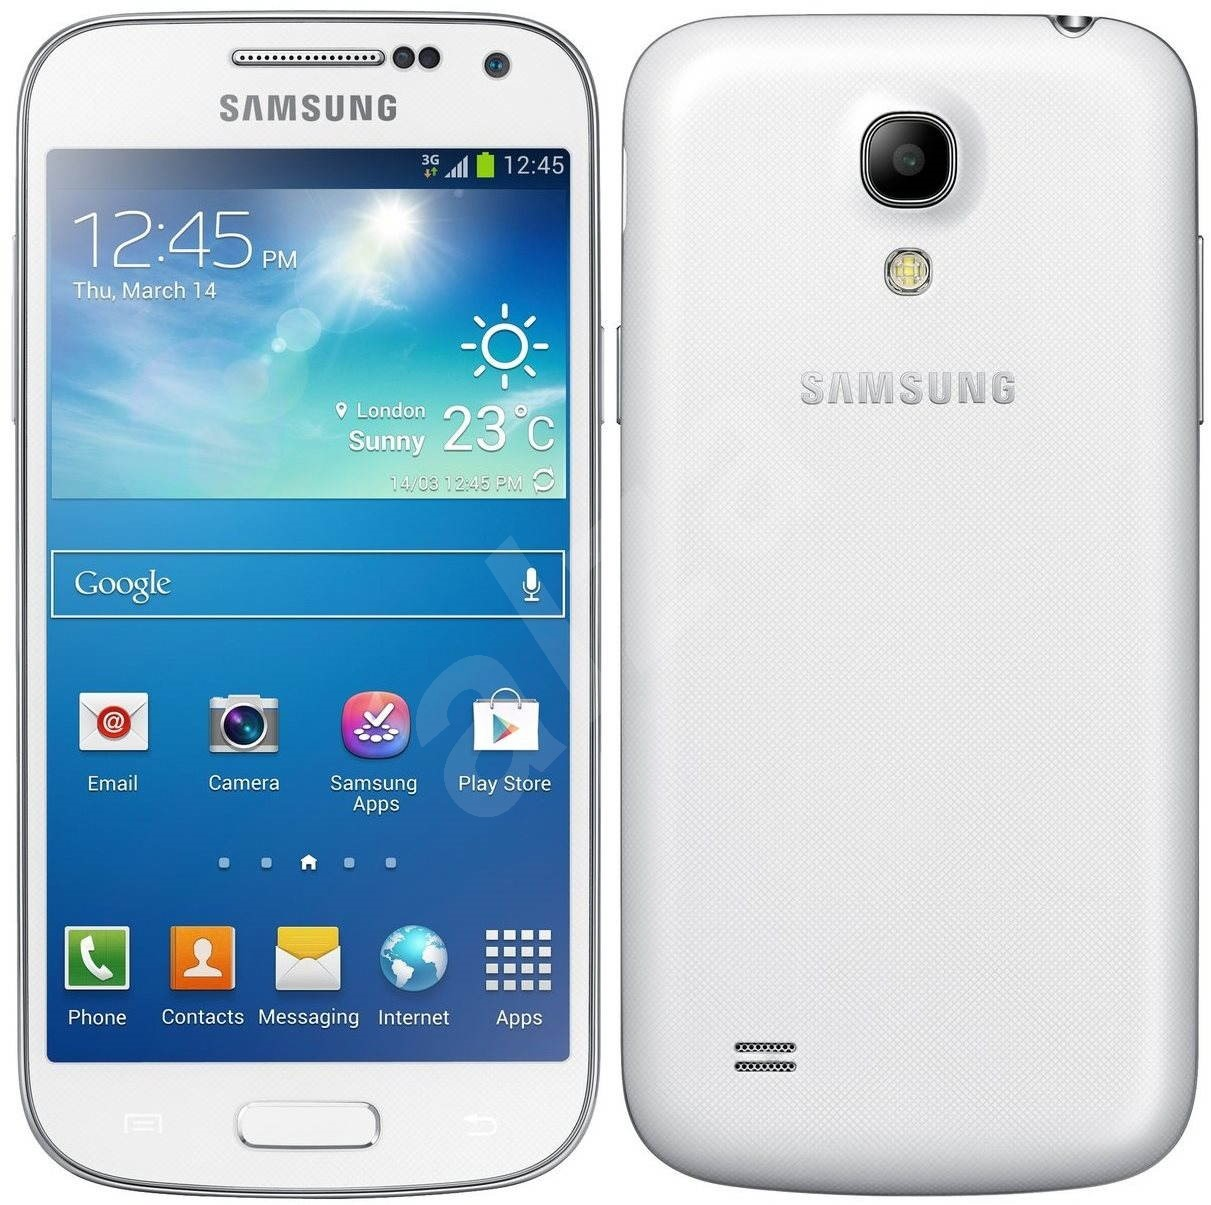 samsung galaxy s4 mini i9195 white mobiln telefon. Black Bedroom Furniture Sets. Home Design Ideas